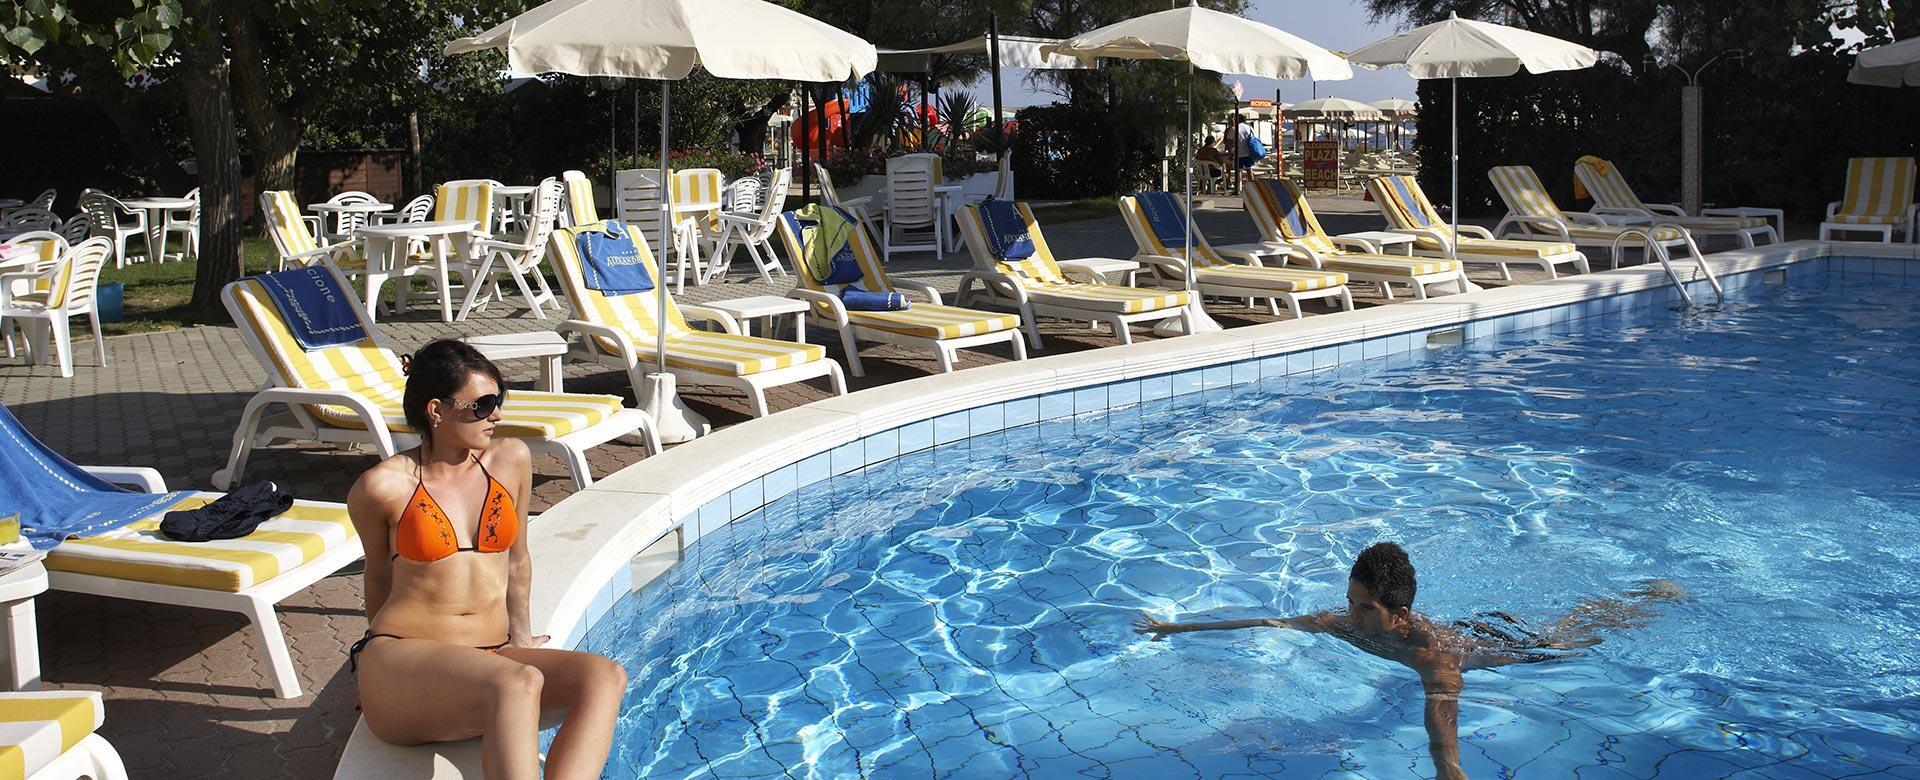 alexandraplaza en seaside-beach-holiday-riccione 003